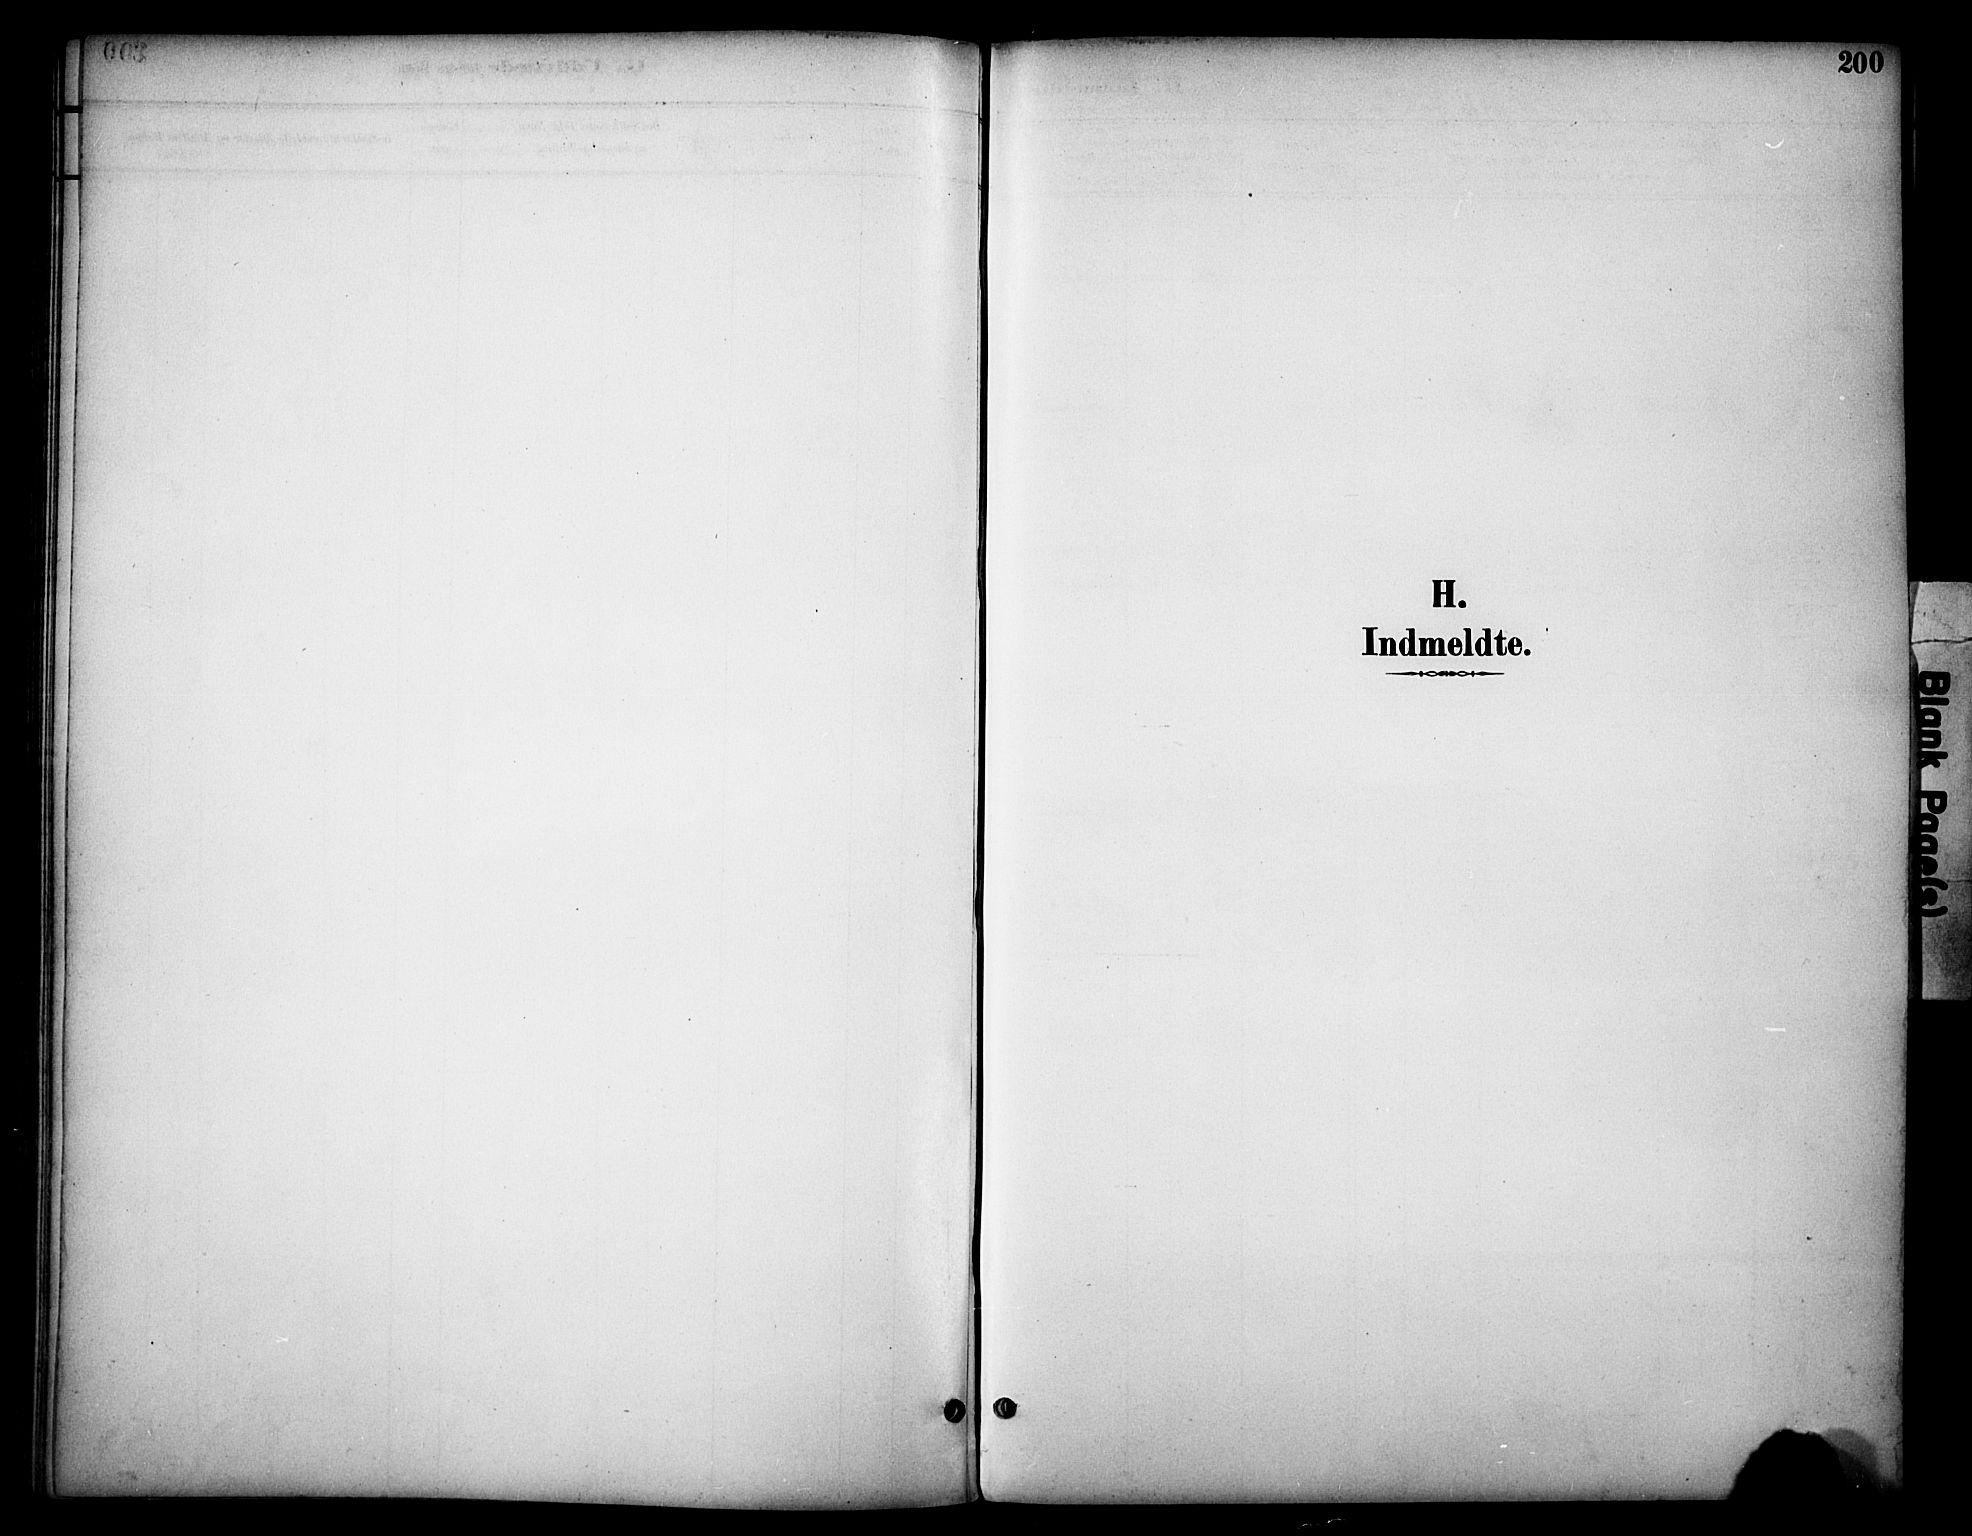 SAH, Dovre prestekontor, Ministerialbok nr. 3, 1891-1901, s. 200